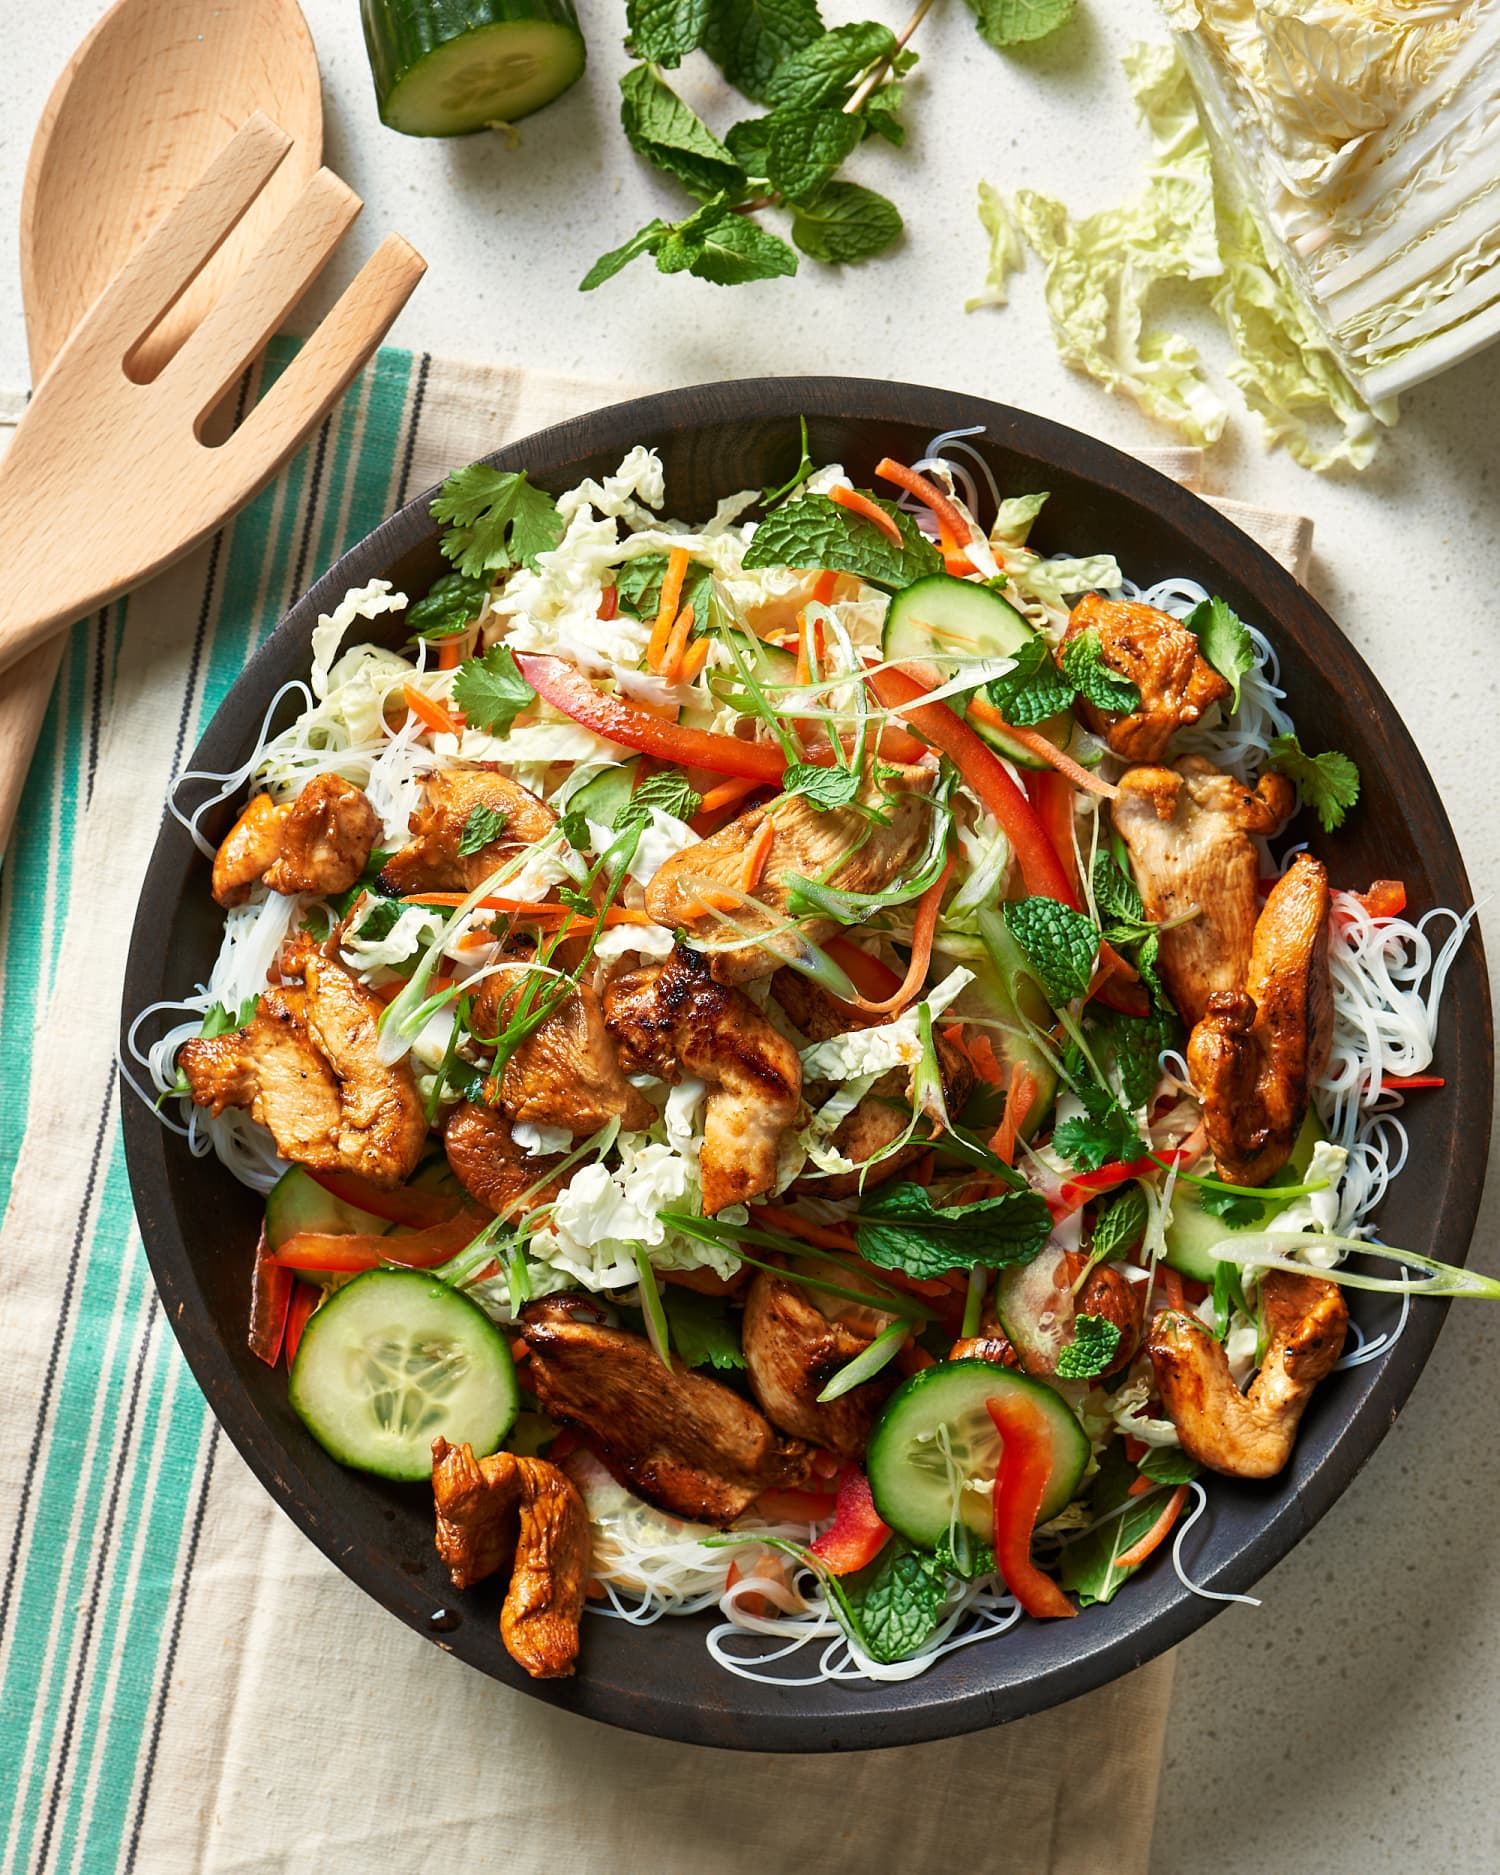 Recipe: Vietnamese-Style Chicken & Noodle Salad